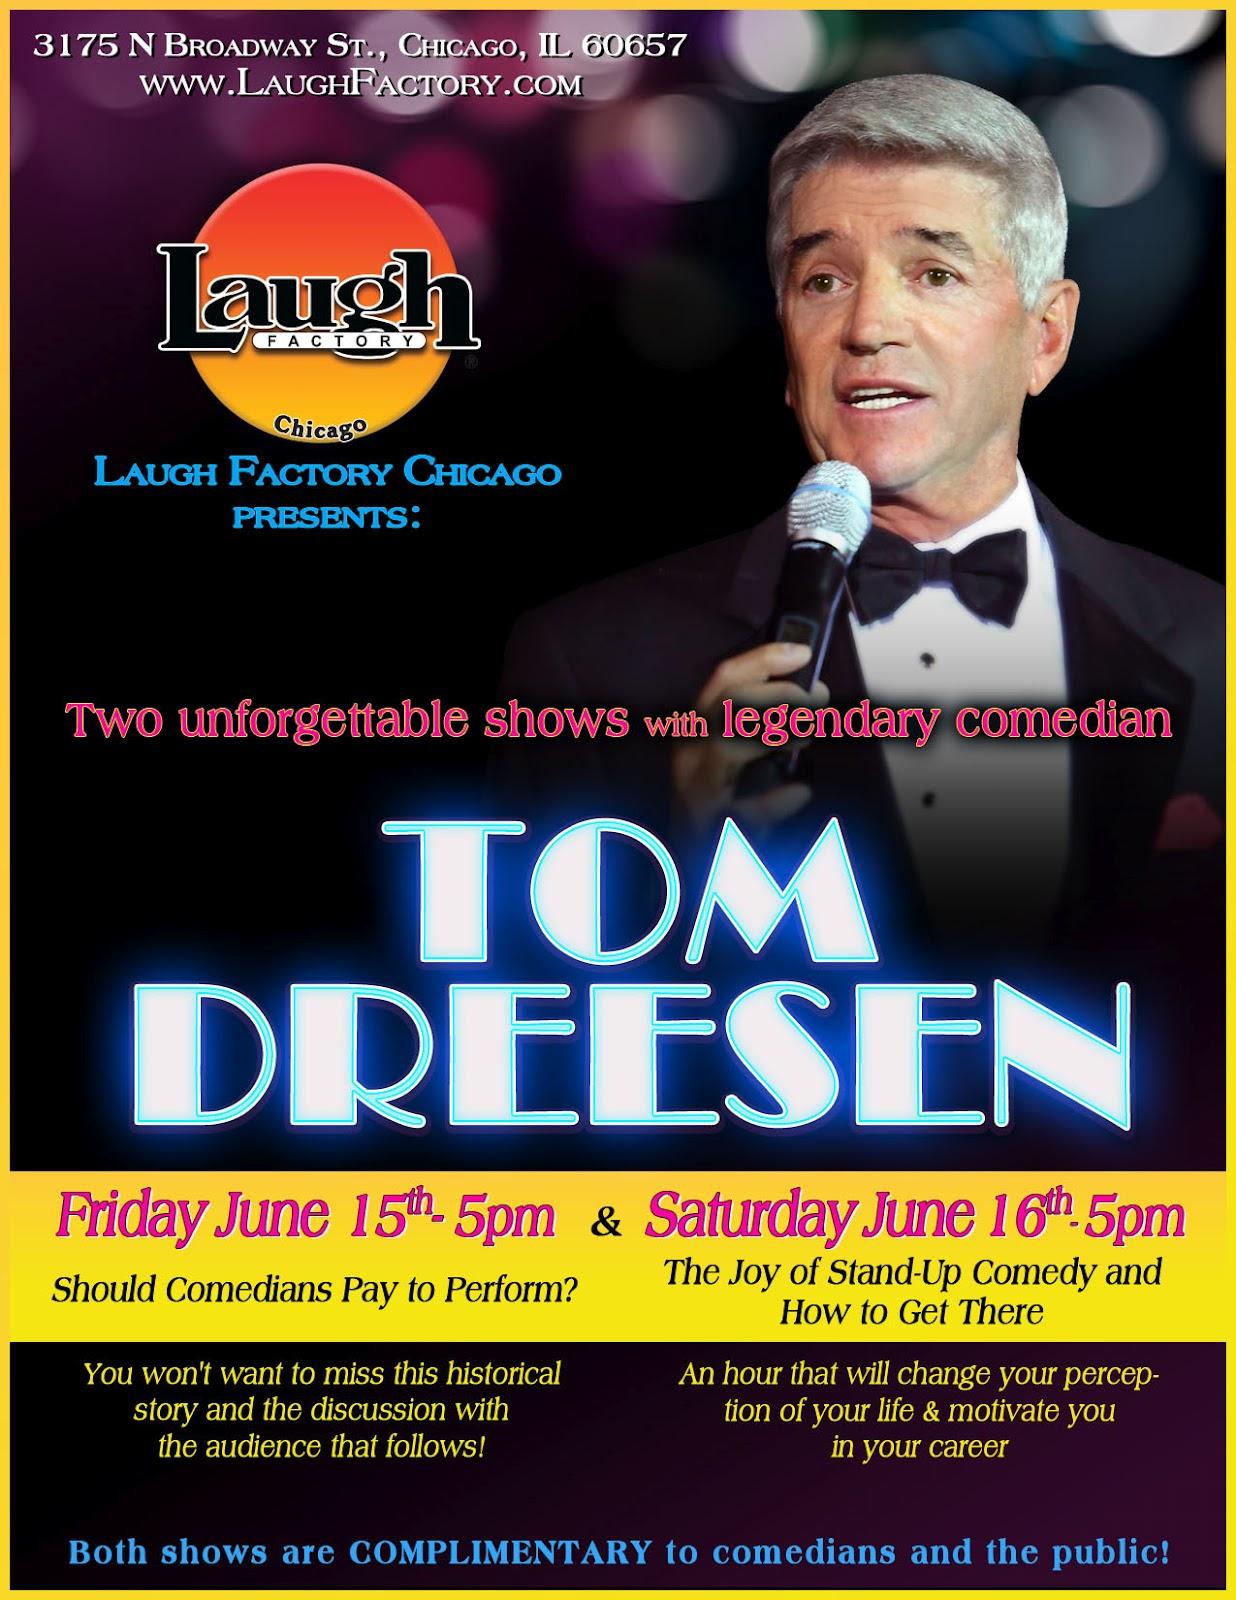 Laugh Factory Event Schedule